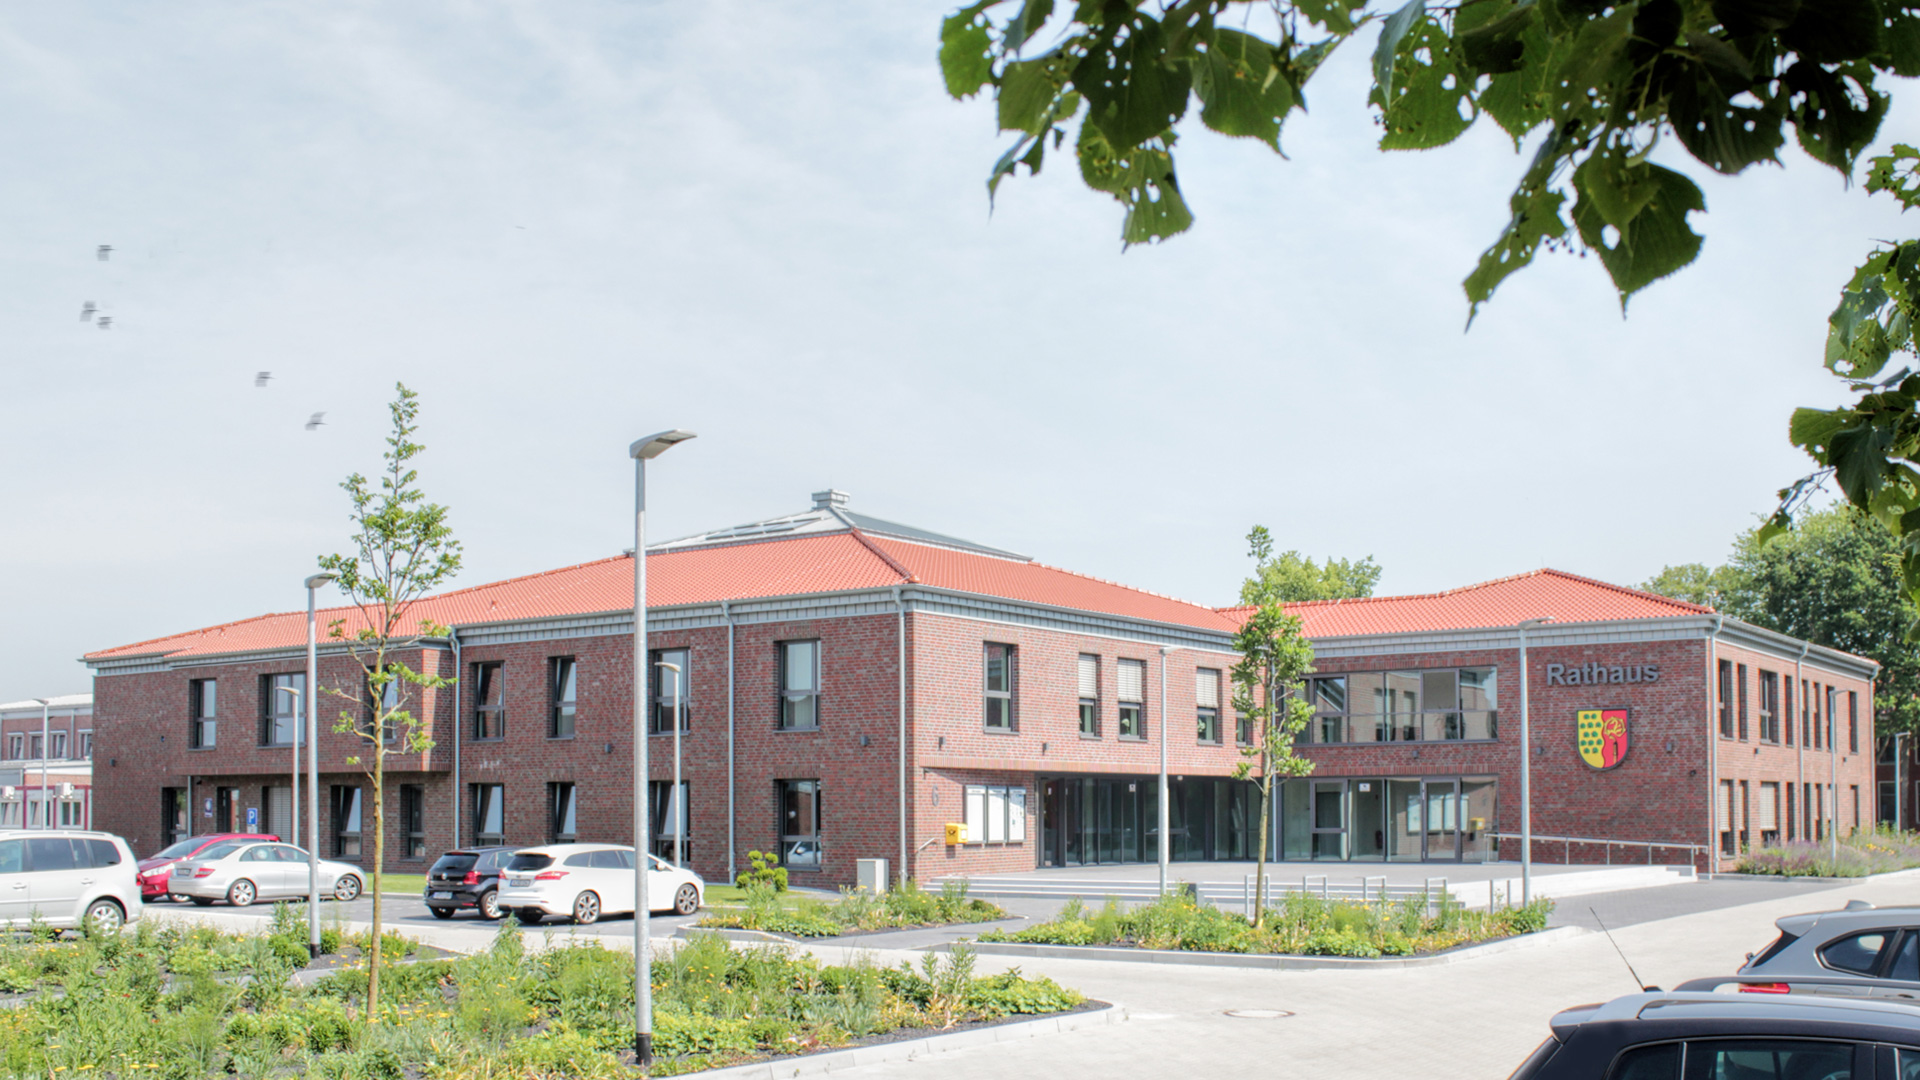 Neubau - Rathaus - Ihlow - 2016/2018